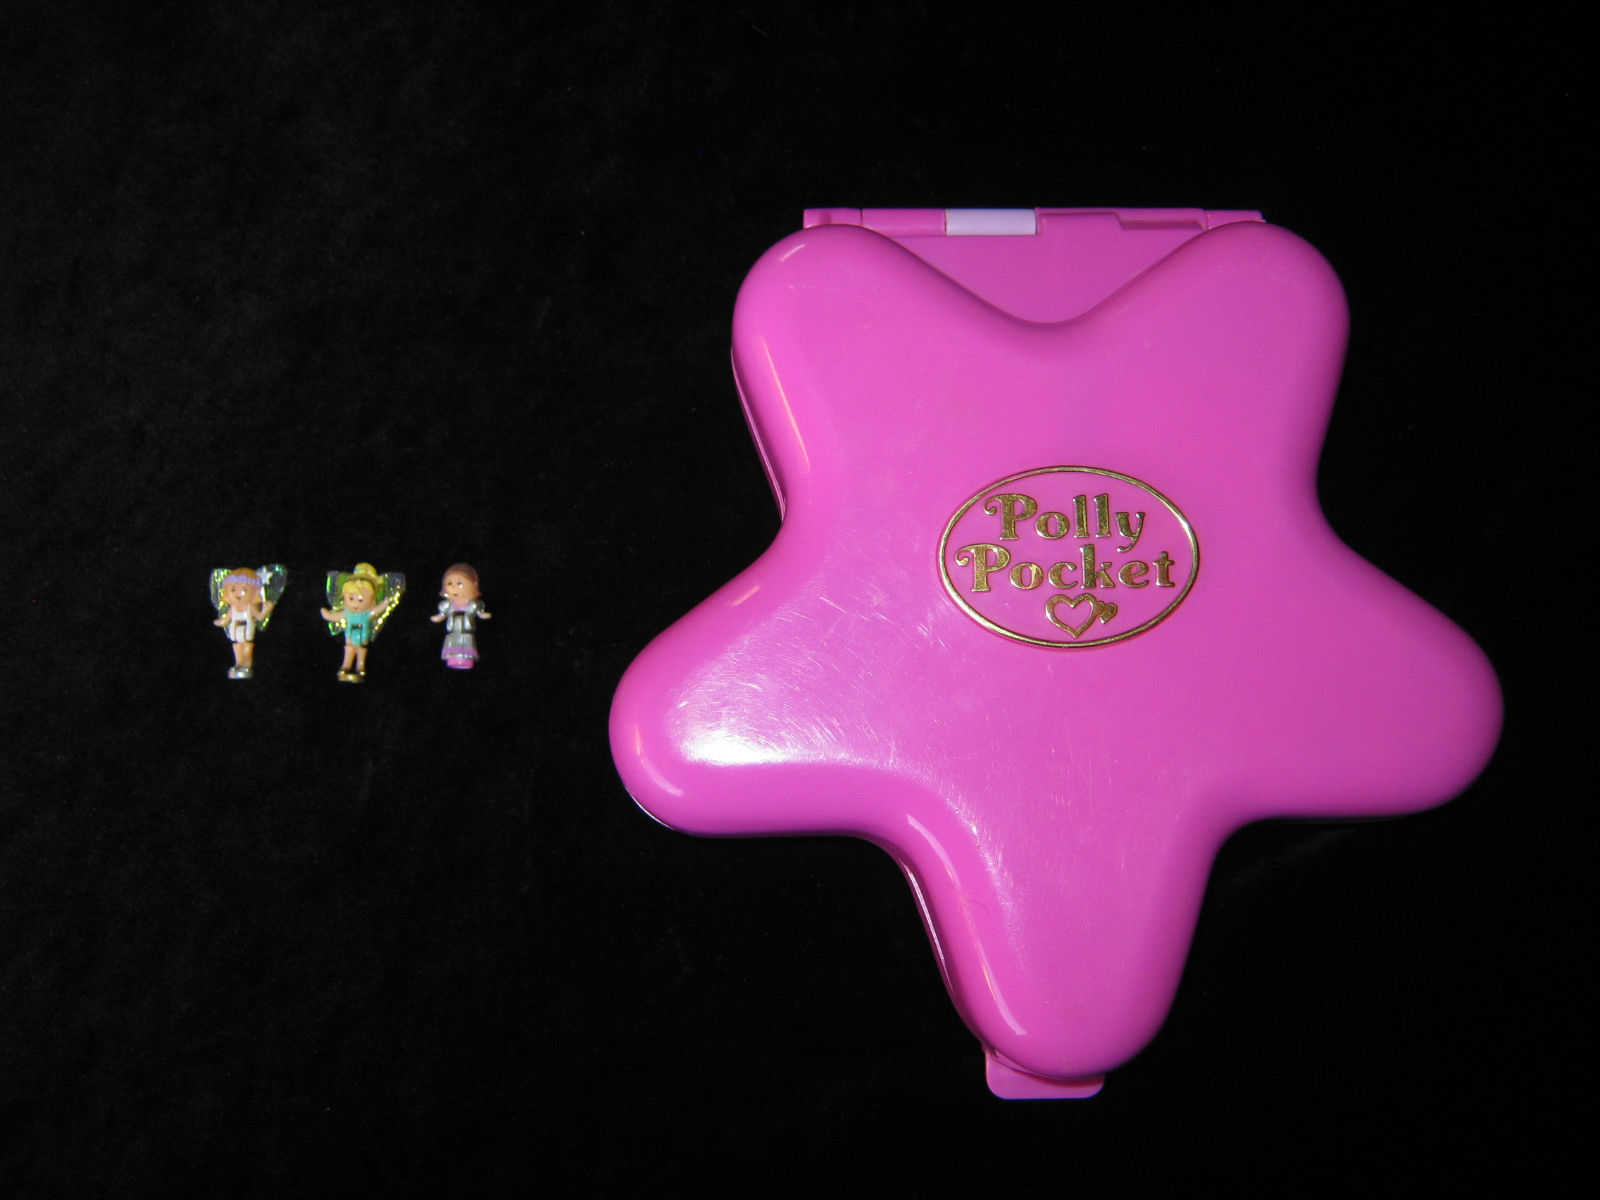 Original Polly Pocket